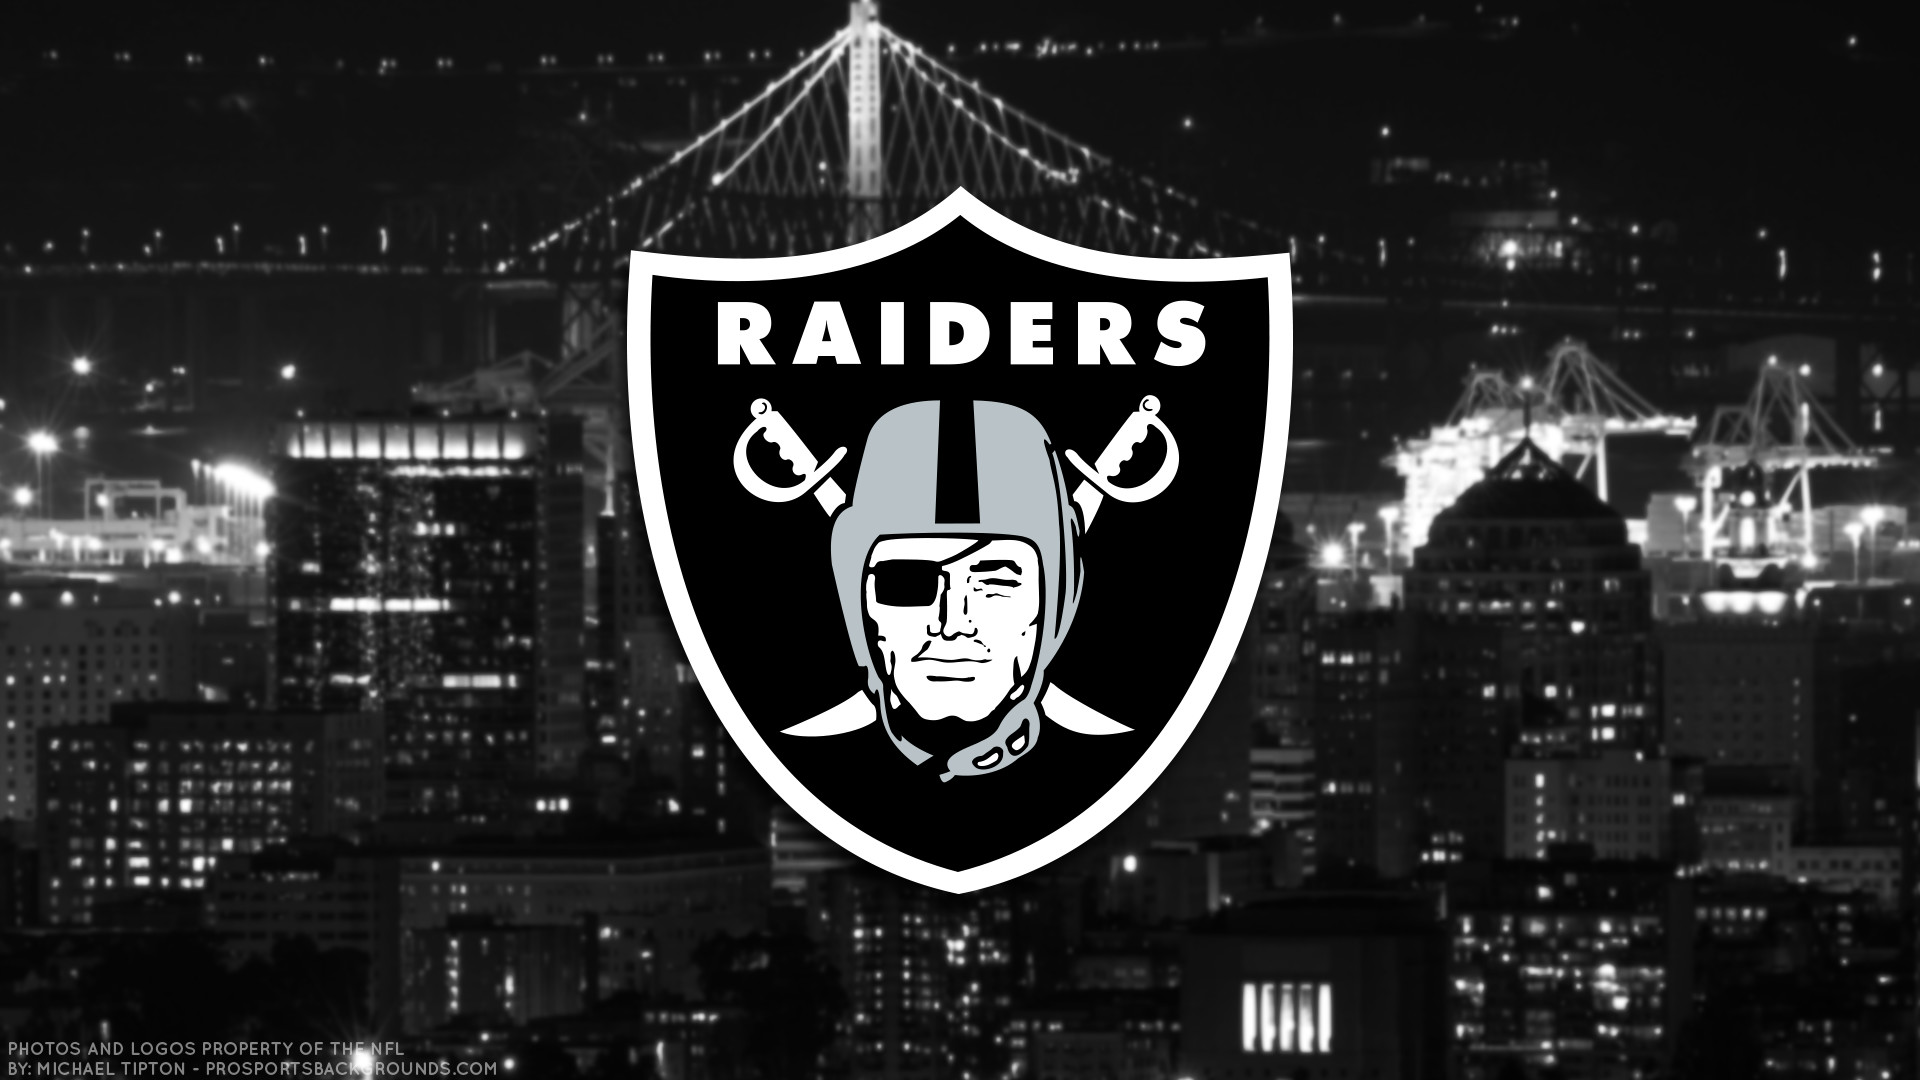 … Oakland Raiders 2017 football logo wallpaper pc desktop computer